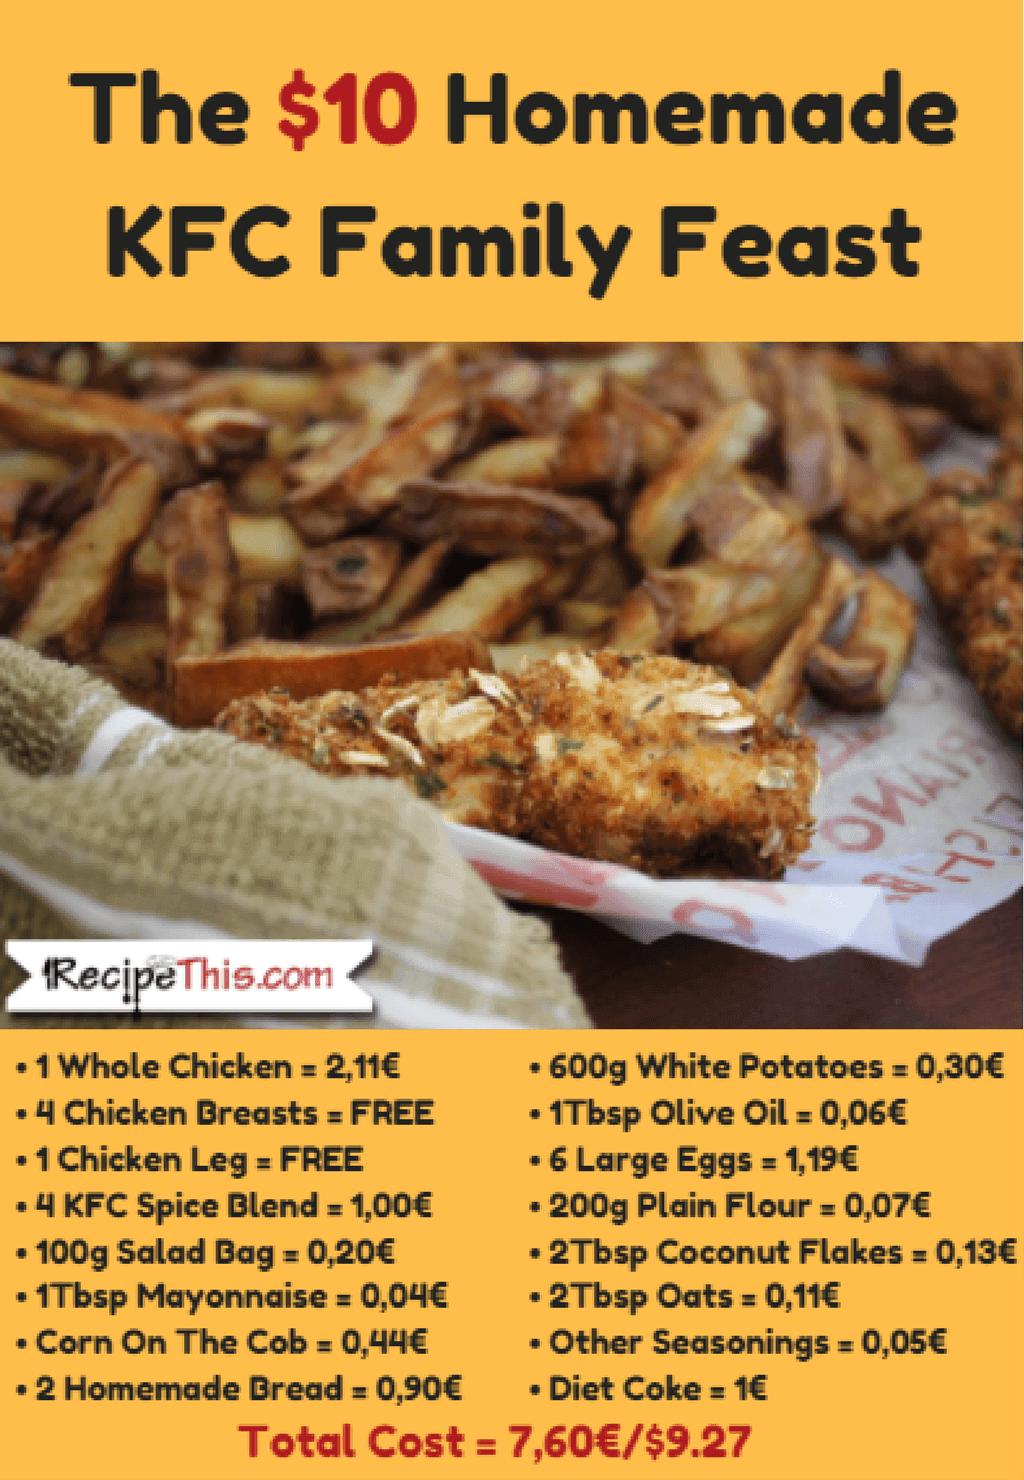 Cheap Family Meals The 10 dollar homemade KFC Feast